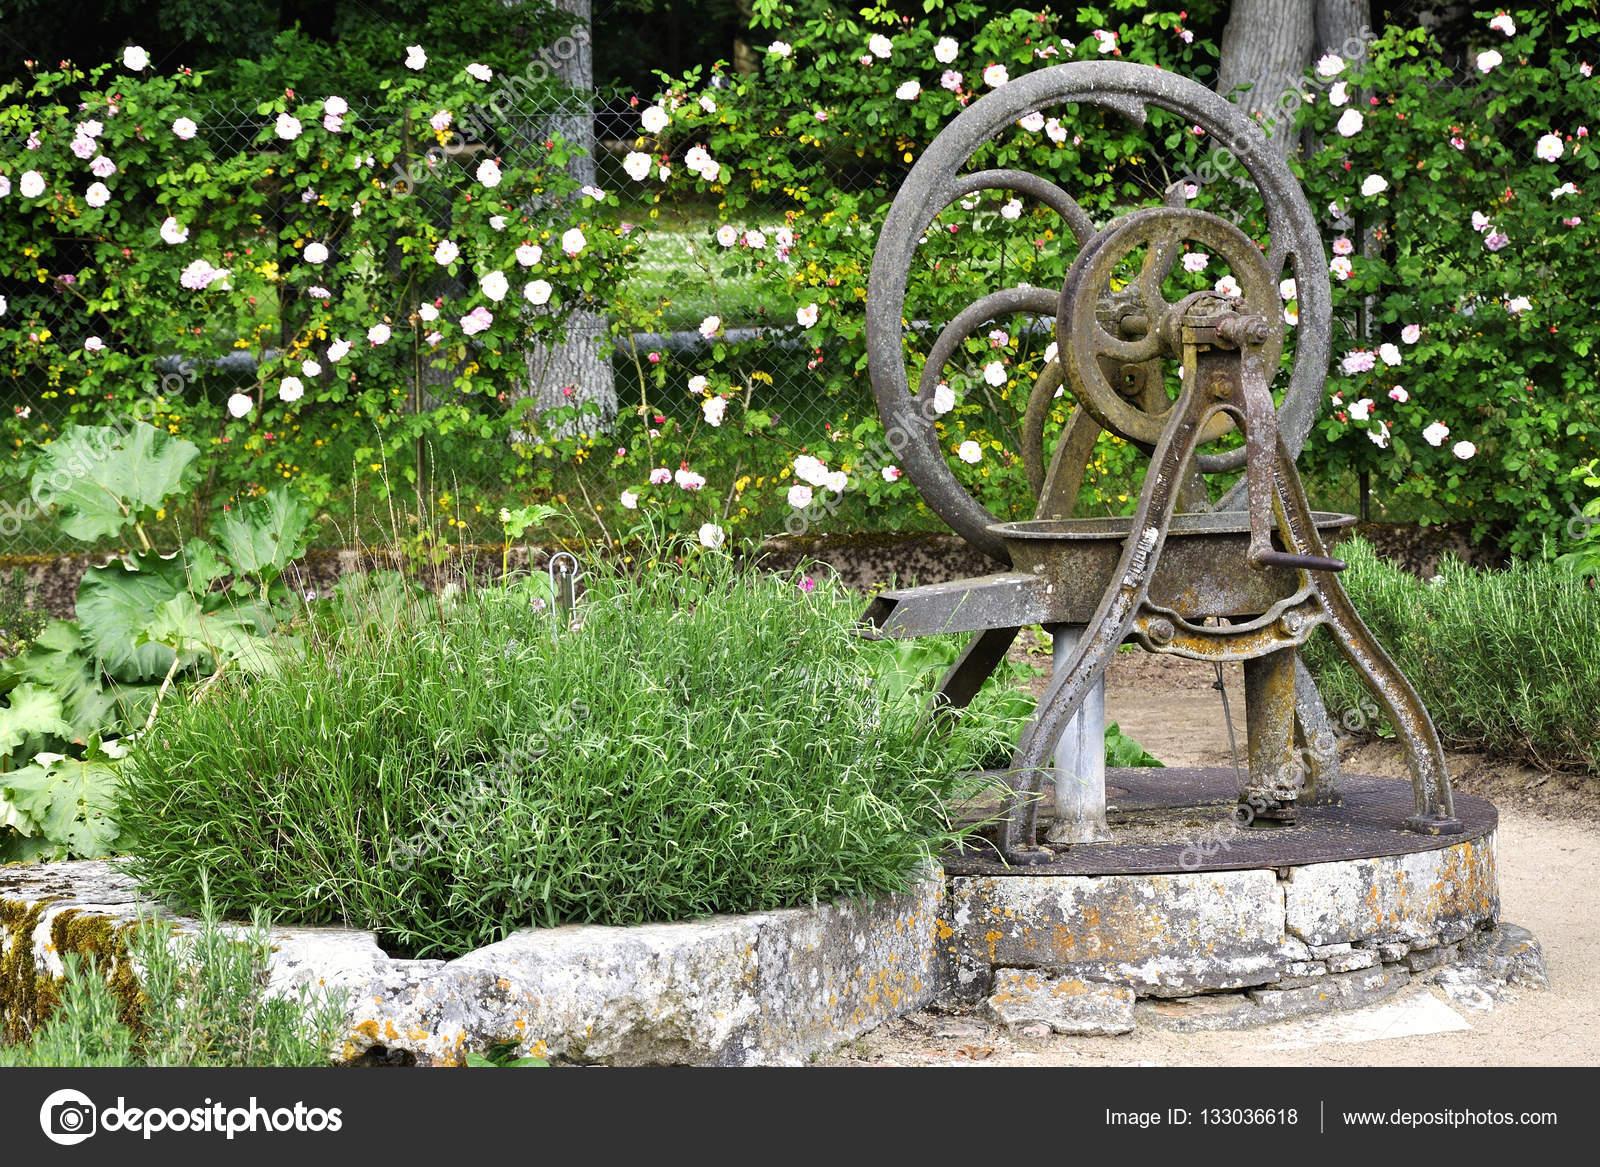 alte wasserpumpe — stockfoto © mirvav #133036618